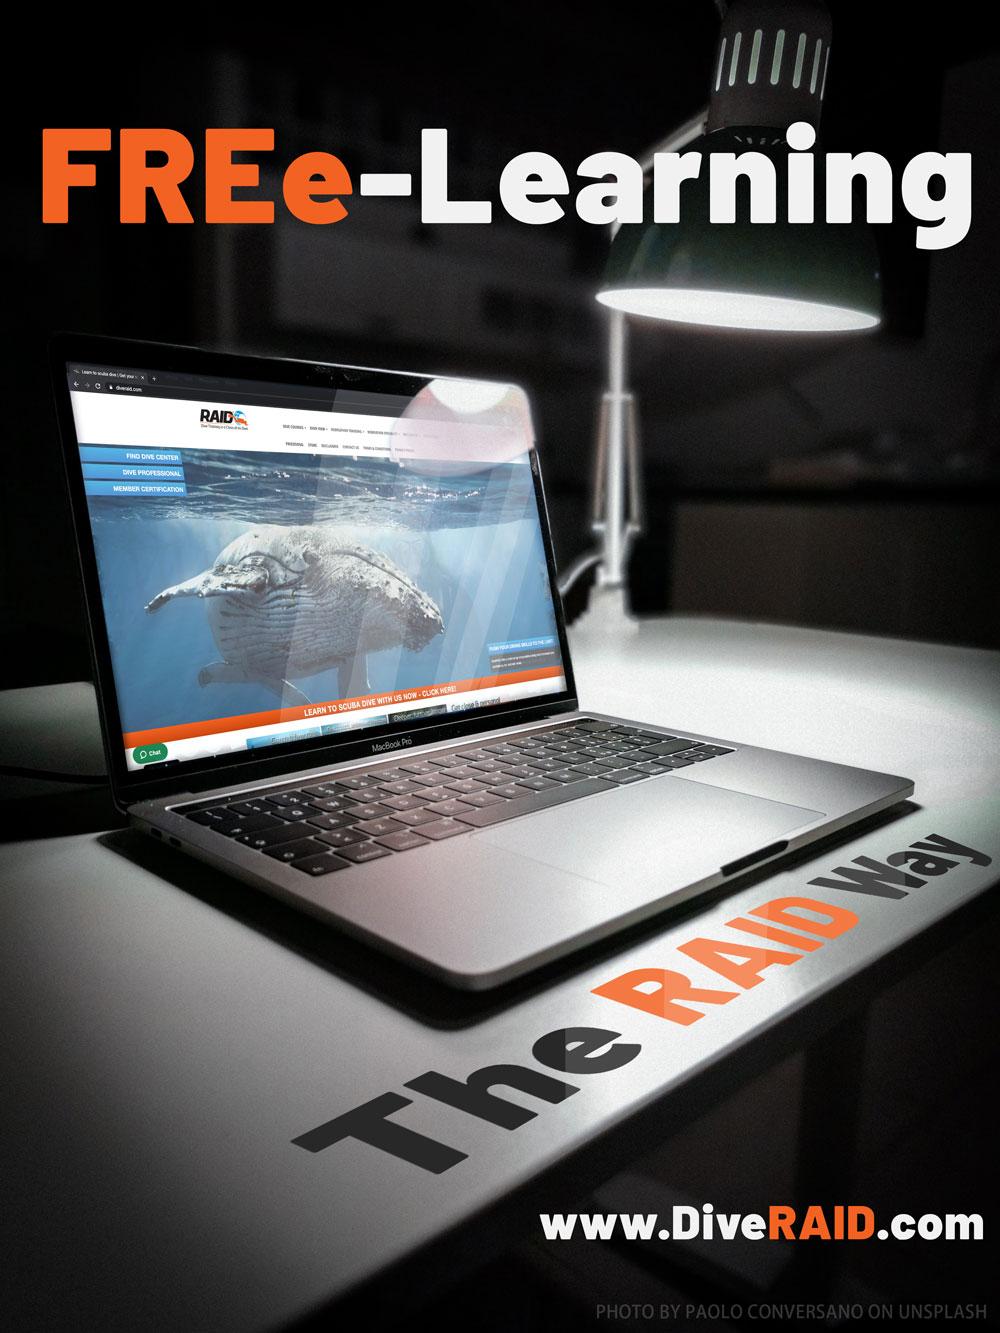 RAID FREe-Learning